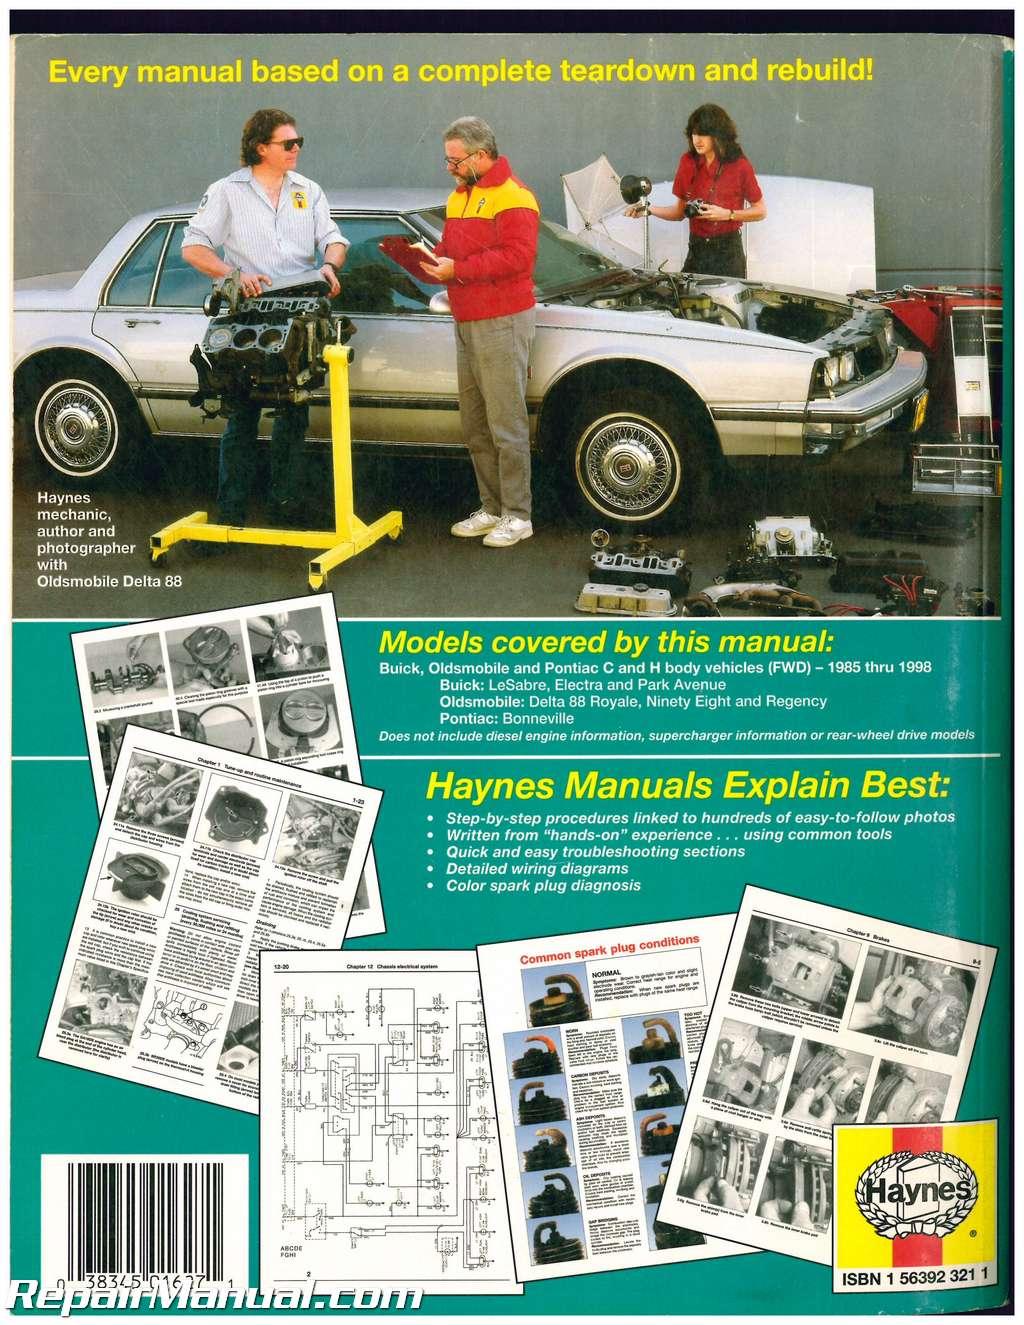 Buick Oldsmobile Pontiac Repair Manual 1985 1998 Haynes Used 1992 88 Royale Wiring Diagram